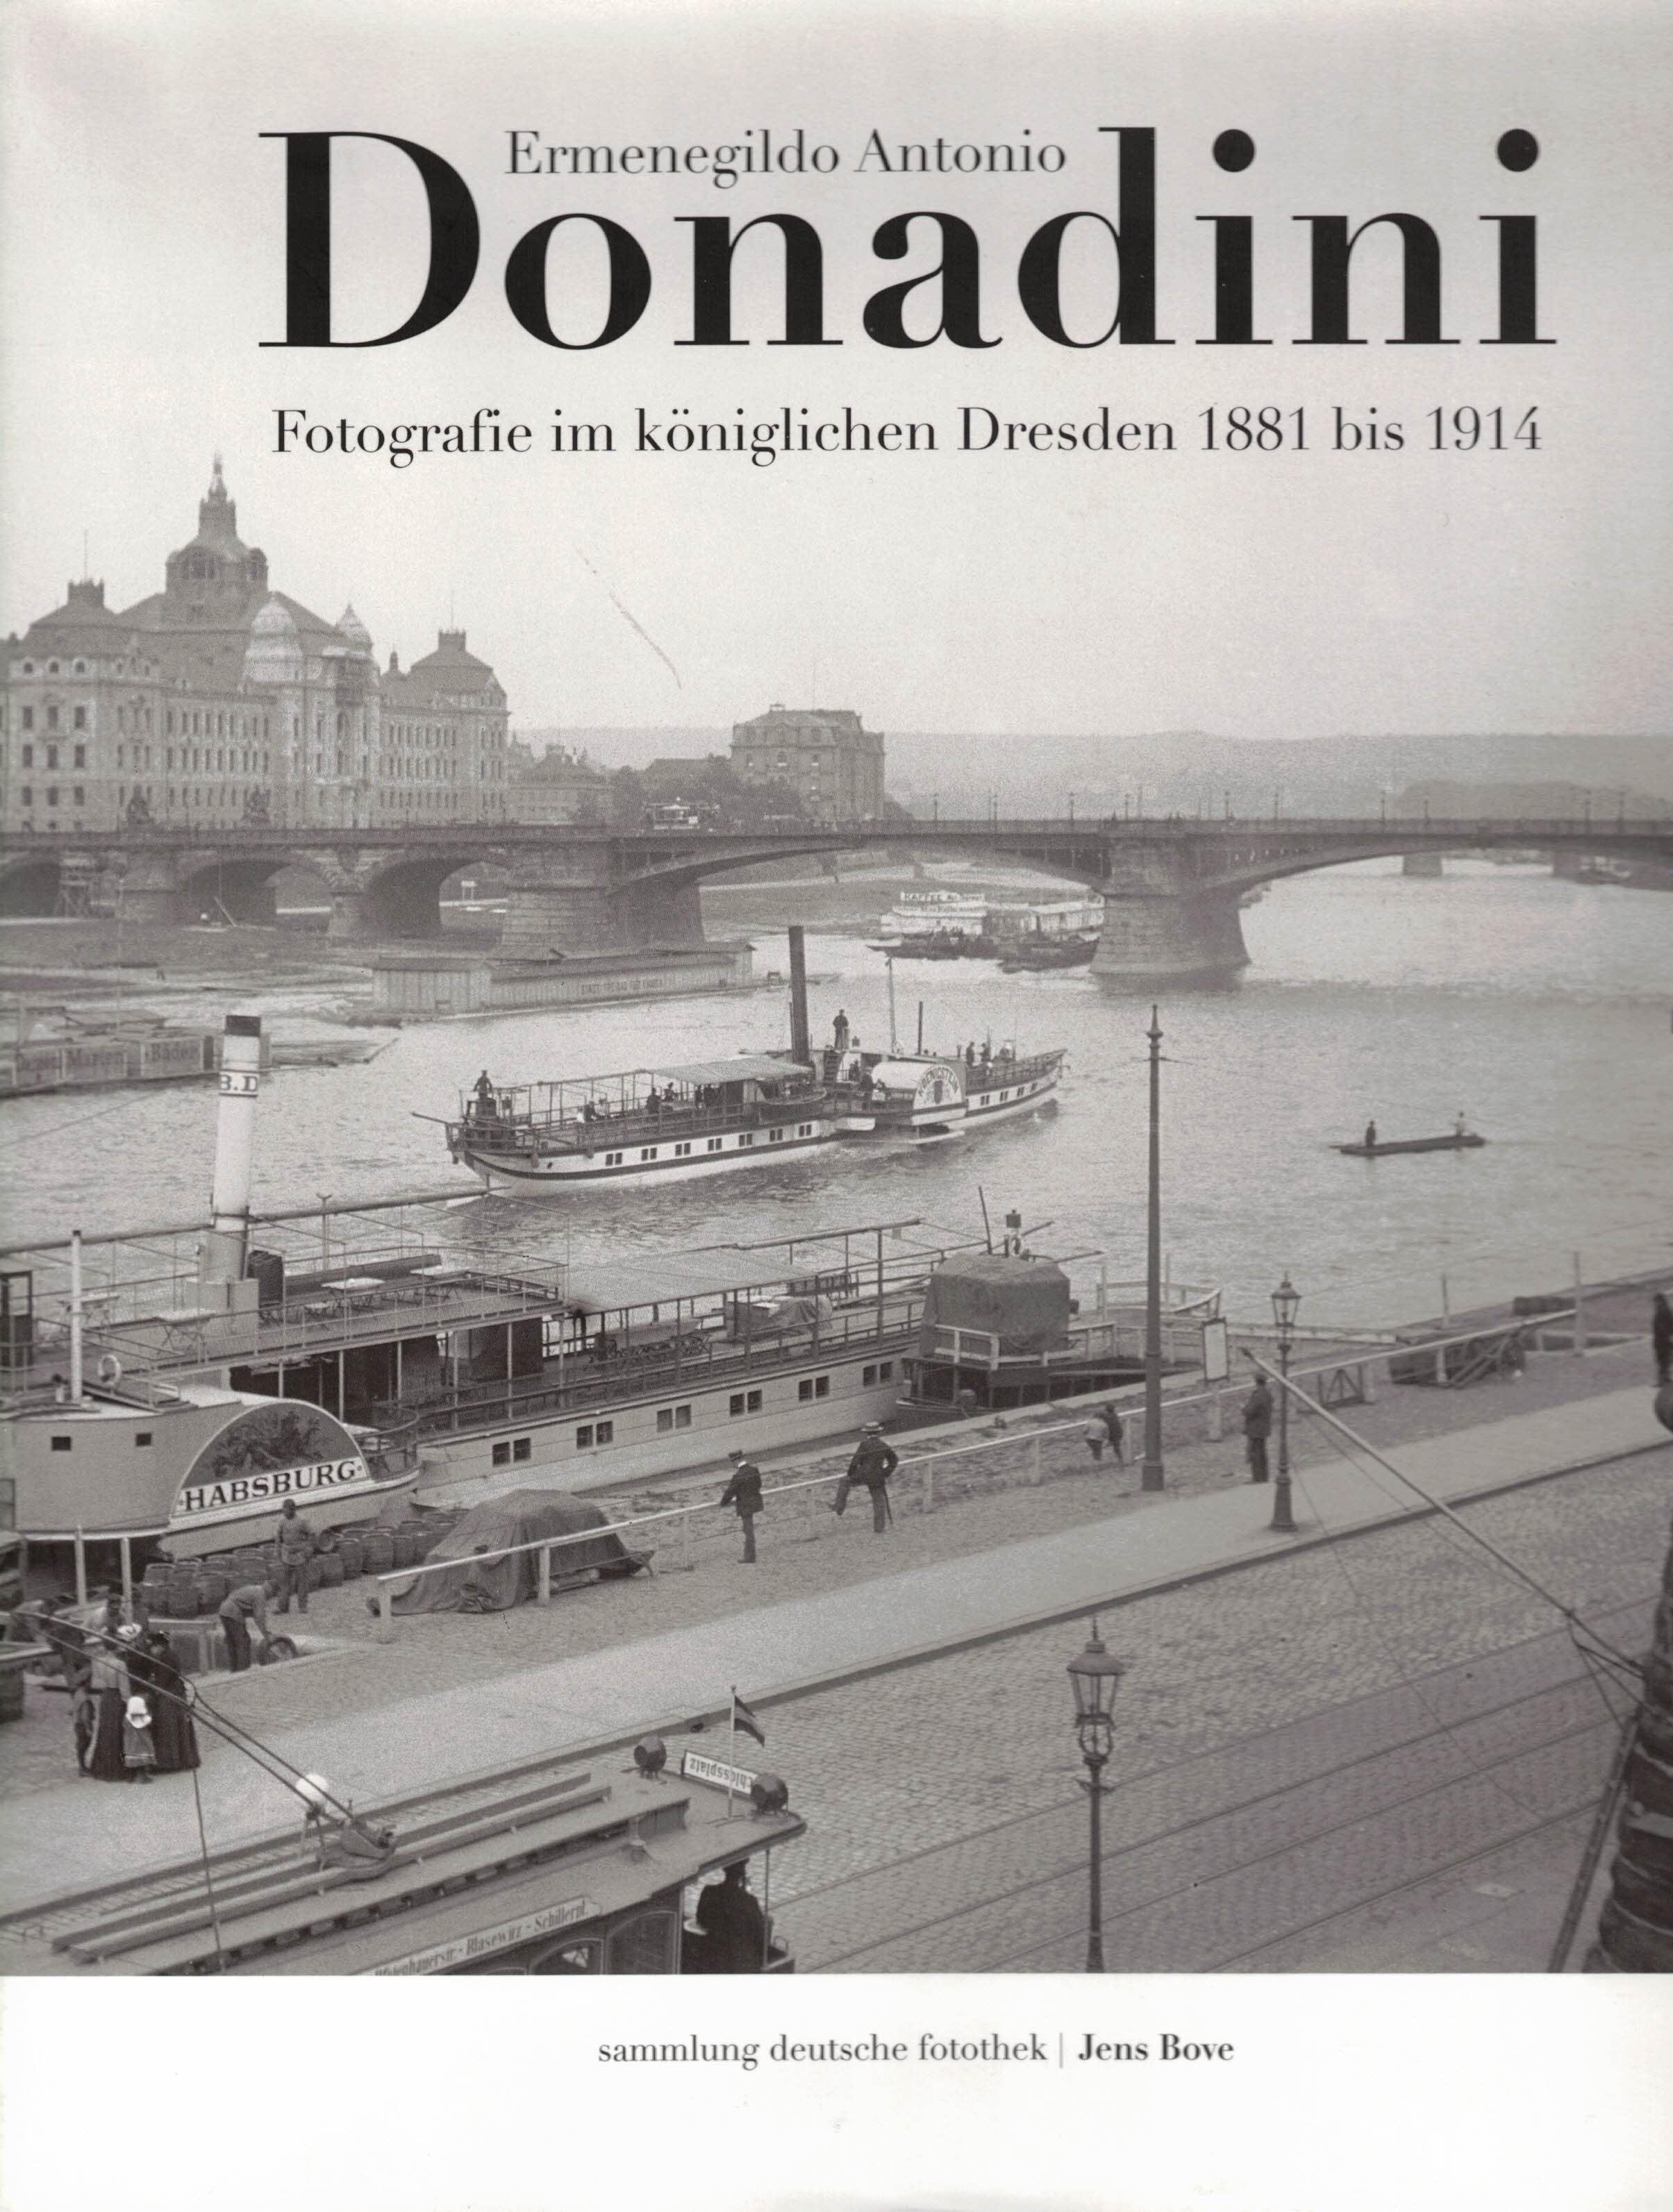 Ermenegildo Antonio Donadini. Fotografie im königlichen Dresden 1881 bis 1914 (Sammlung Deutsche Fotothek Band 1). - Bove, Jens